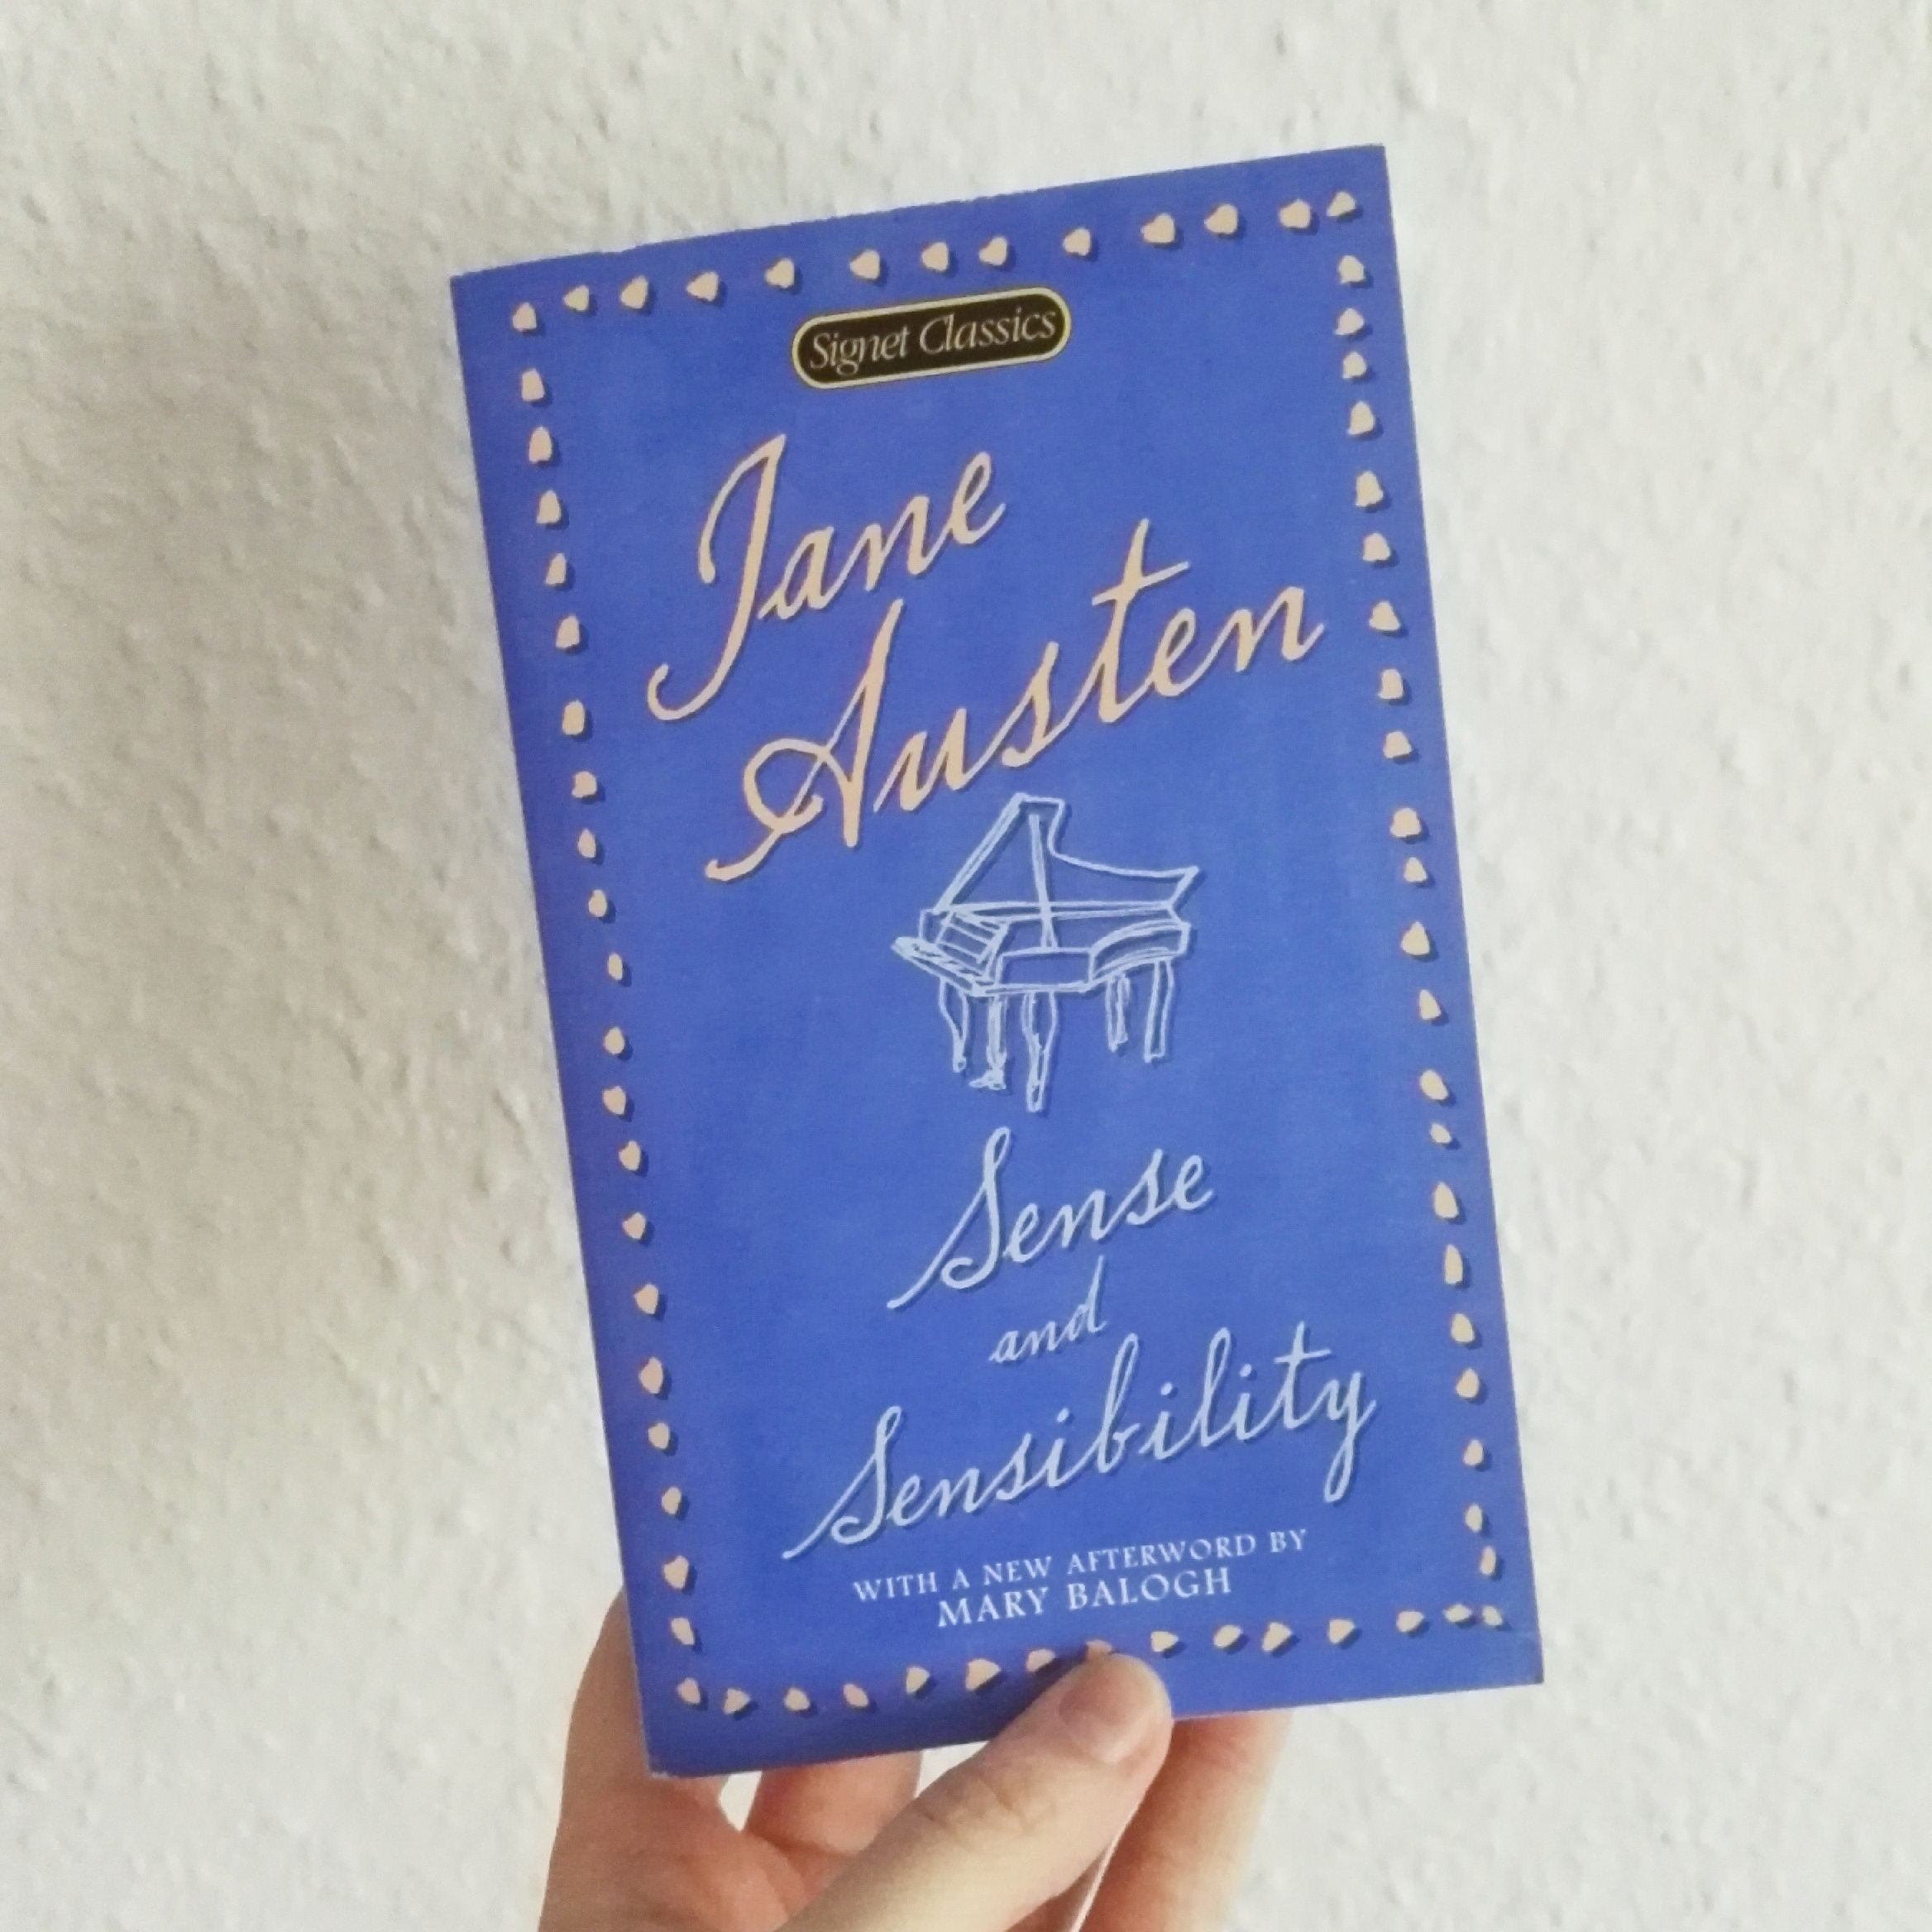 Jane Austen – Sense and Sensibility